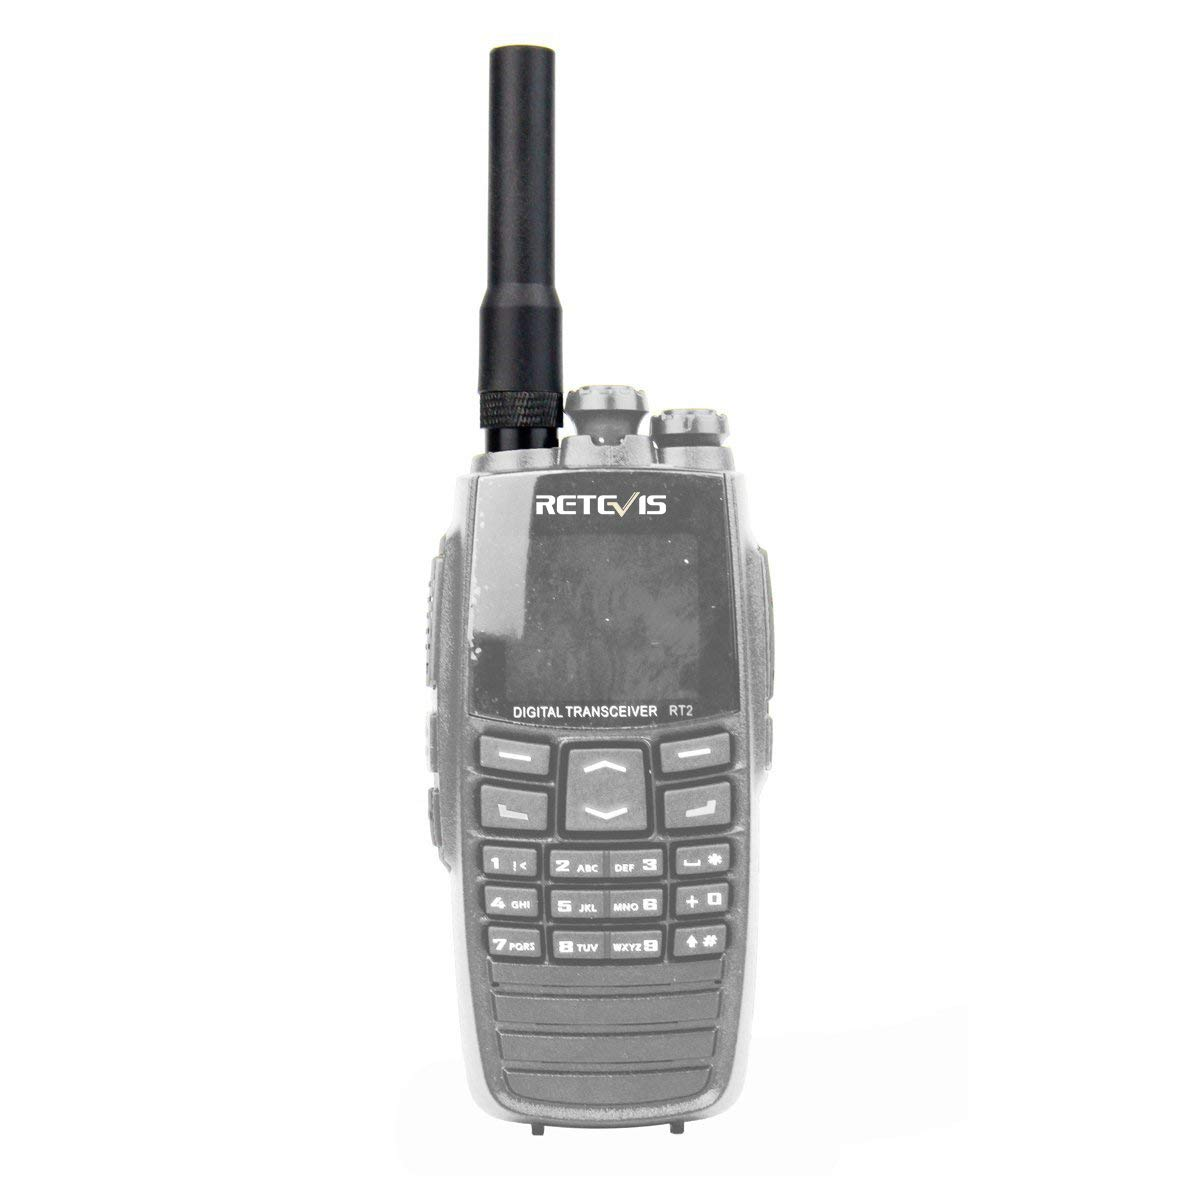 Retevis Walkie Talkie Antenna SMA-M Dual Band VHF/UHF Antenna for Baofeng BF-UV3R YAESU VX-1R Retevis RT1 RT2 RT82 TYT UVF8 Two Way Radio(1 Pack)